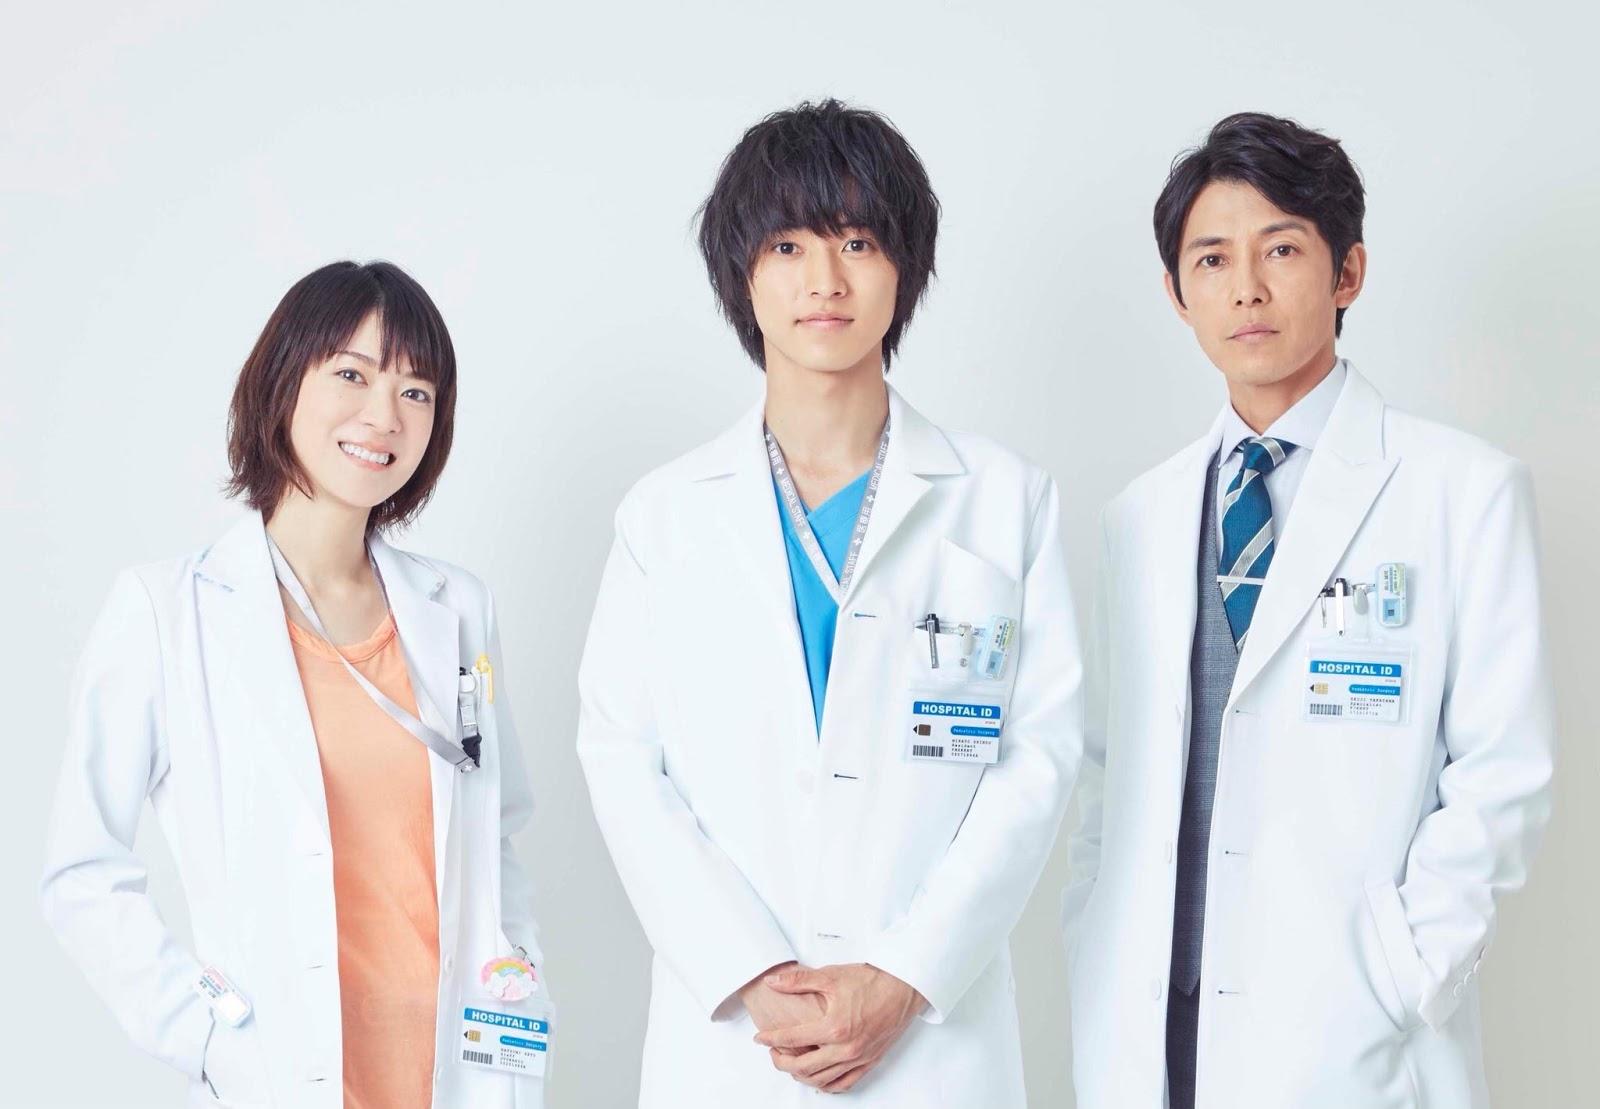 Review J Drama Good Doctor 2018 Clover Blossoms